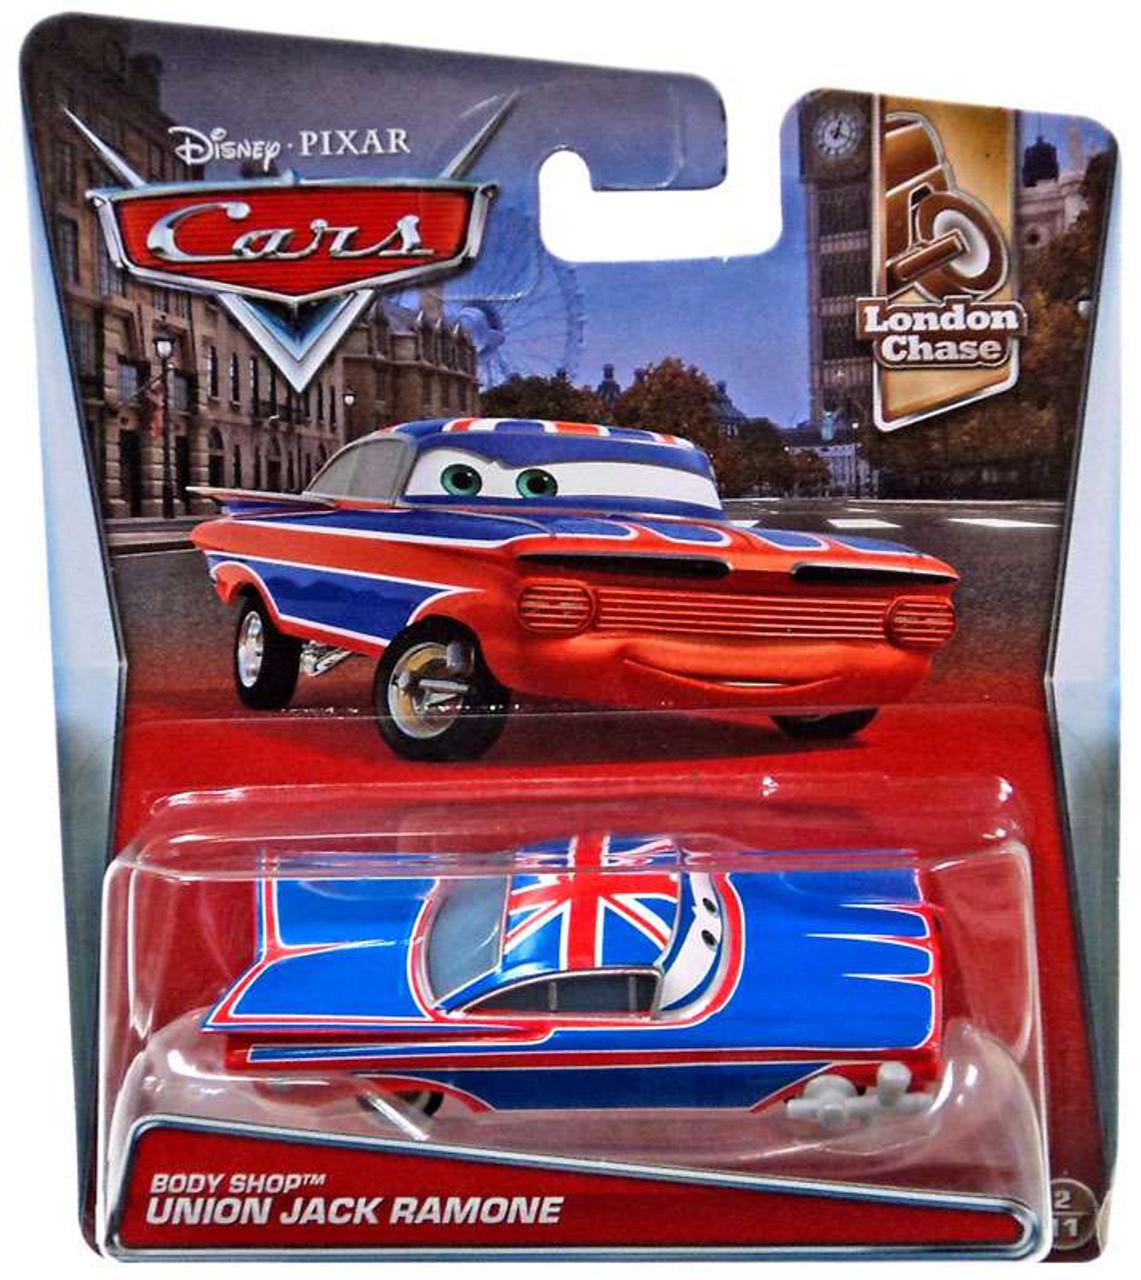 Disney Pixar Cars London Chase Body Shop Union Jack Ramone 155 Diecast Car 211 Mattel Toys Toywiz